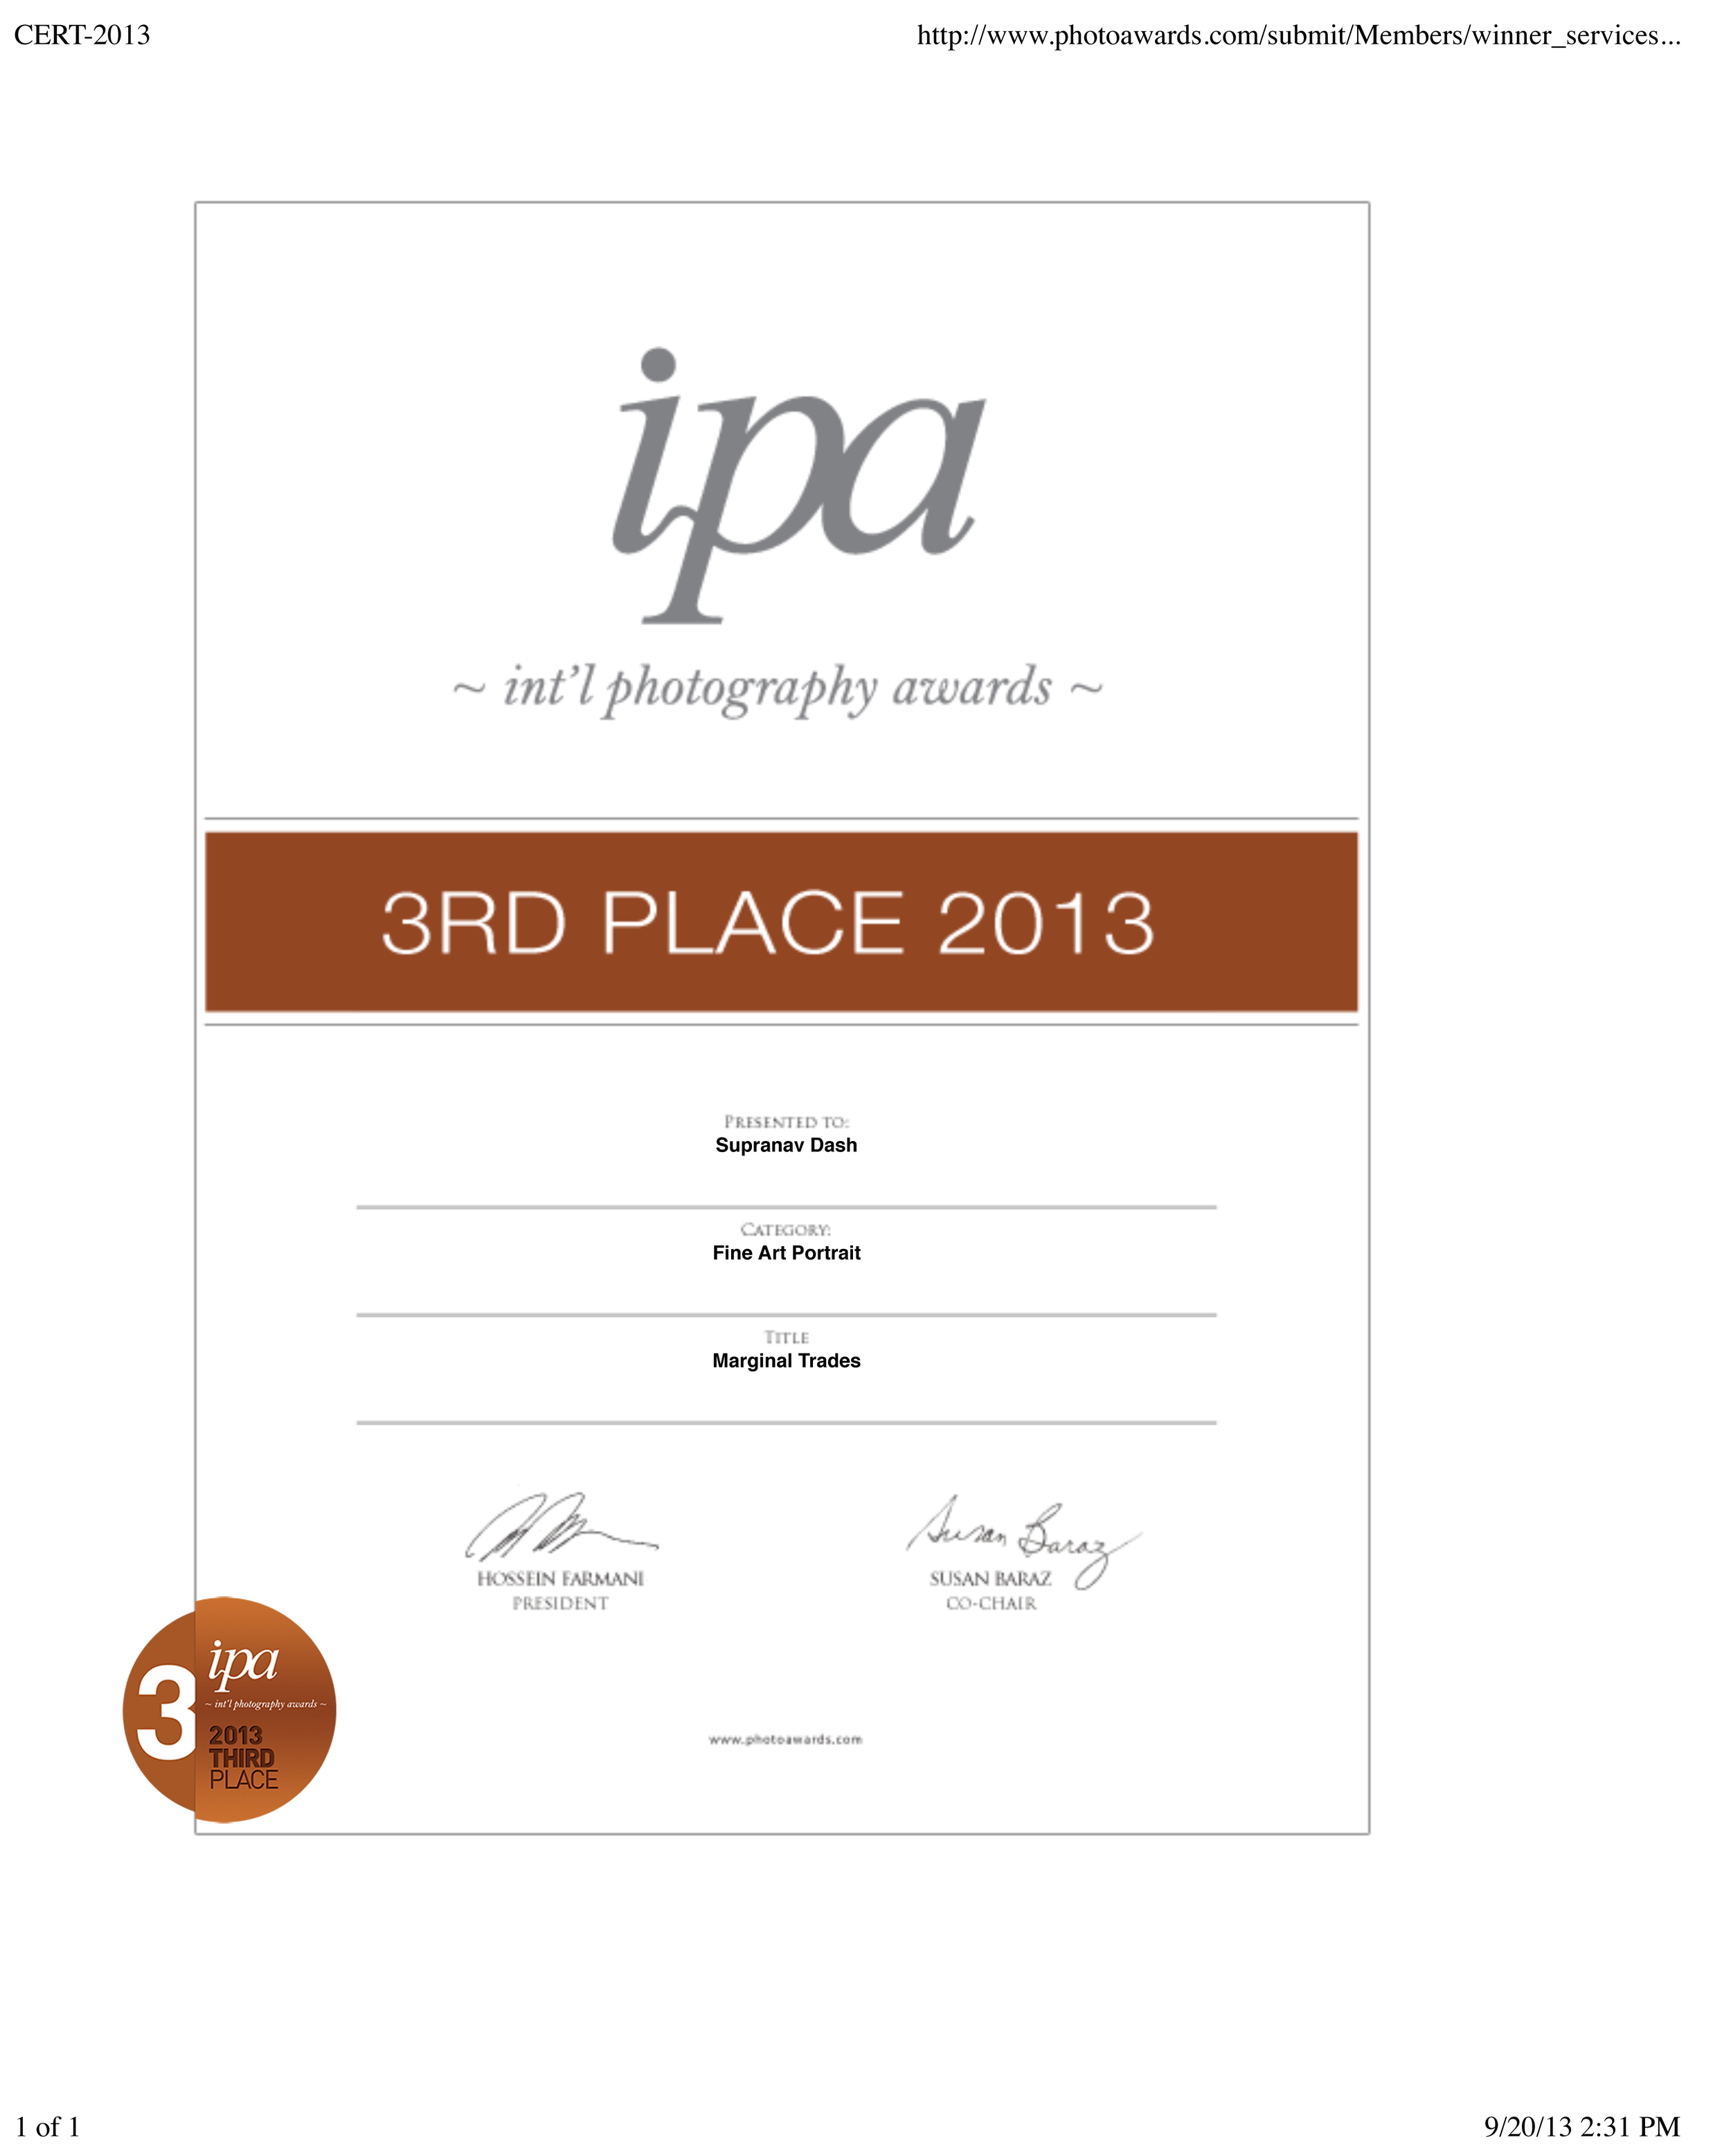 IPA_CERT-2013.jpg